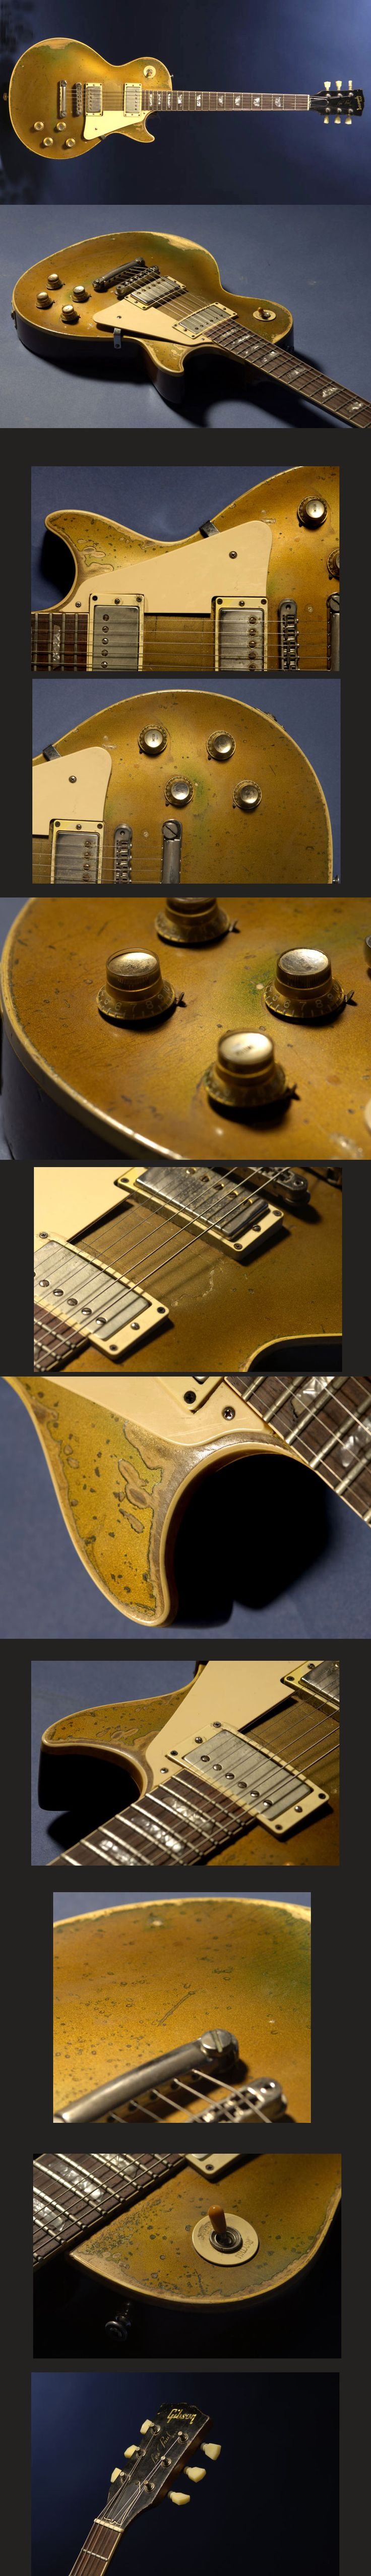 1968 Gibson Les Paul Std. Goldtop converted to PAFs...Gregor Hilden N°1 Guitar!!!